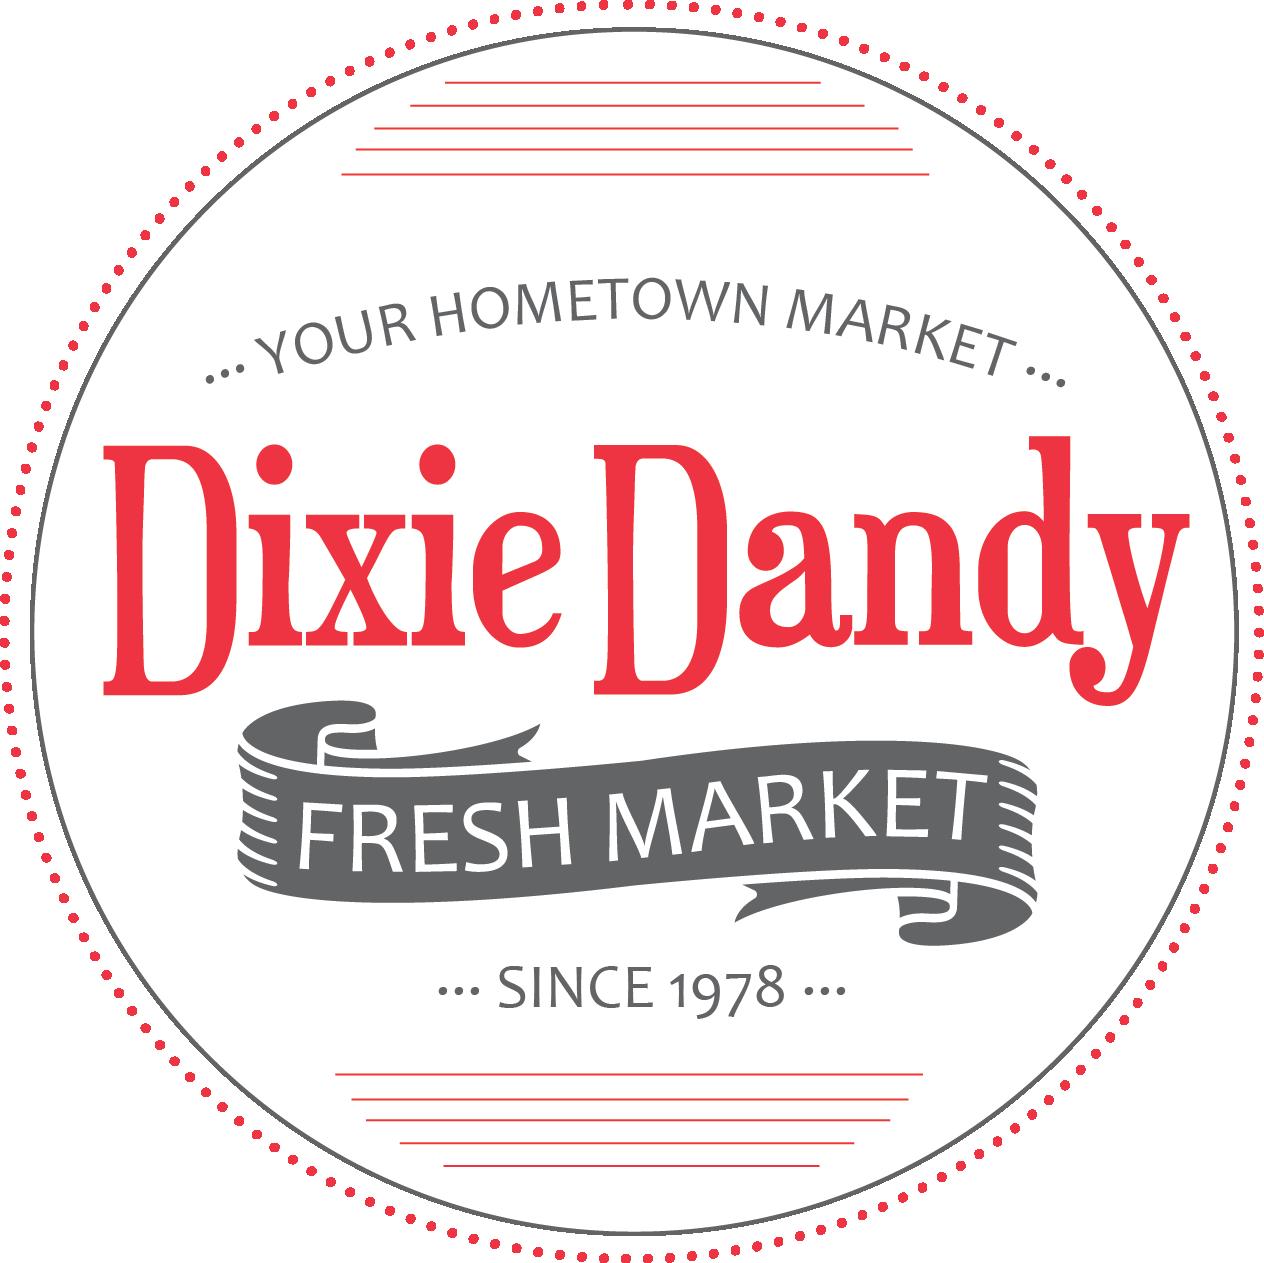 Dixie Dandy Fresh Market.png